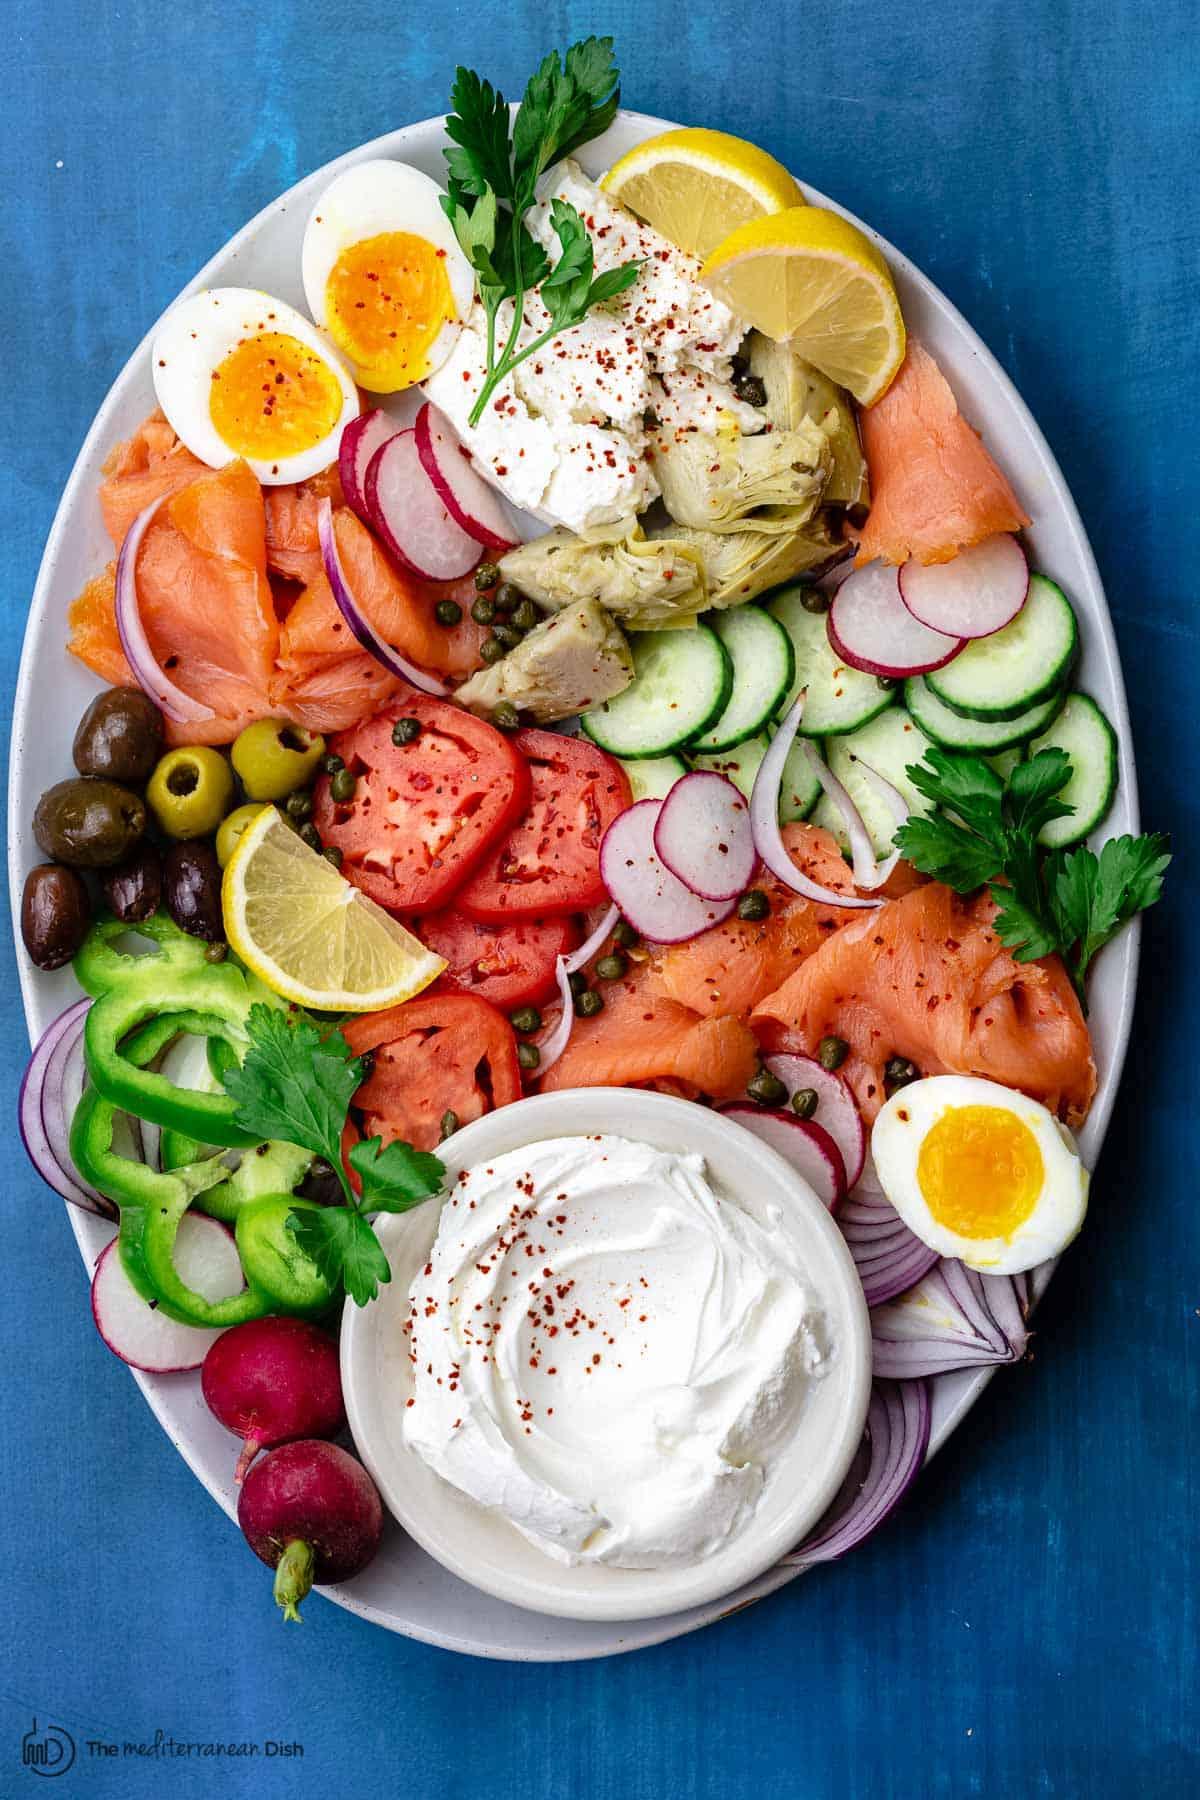 Easy Smoked Salmon Platter The Mediterranean Dish